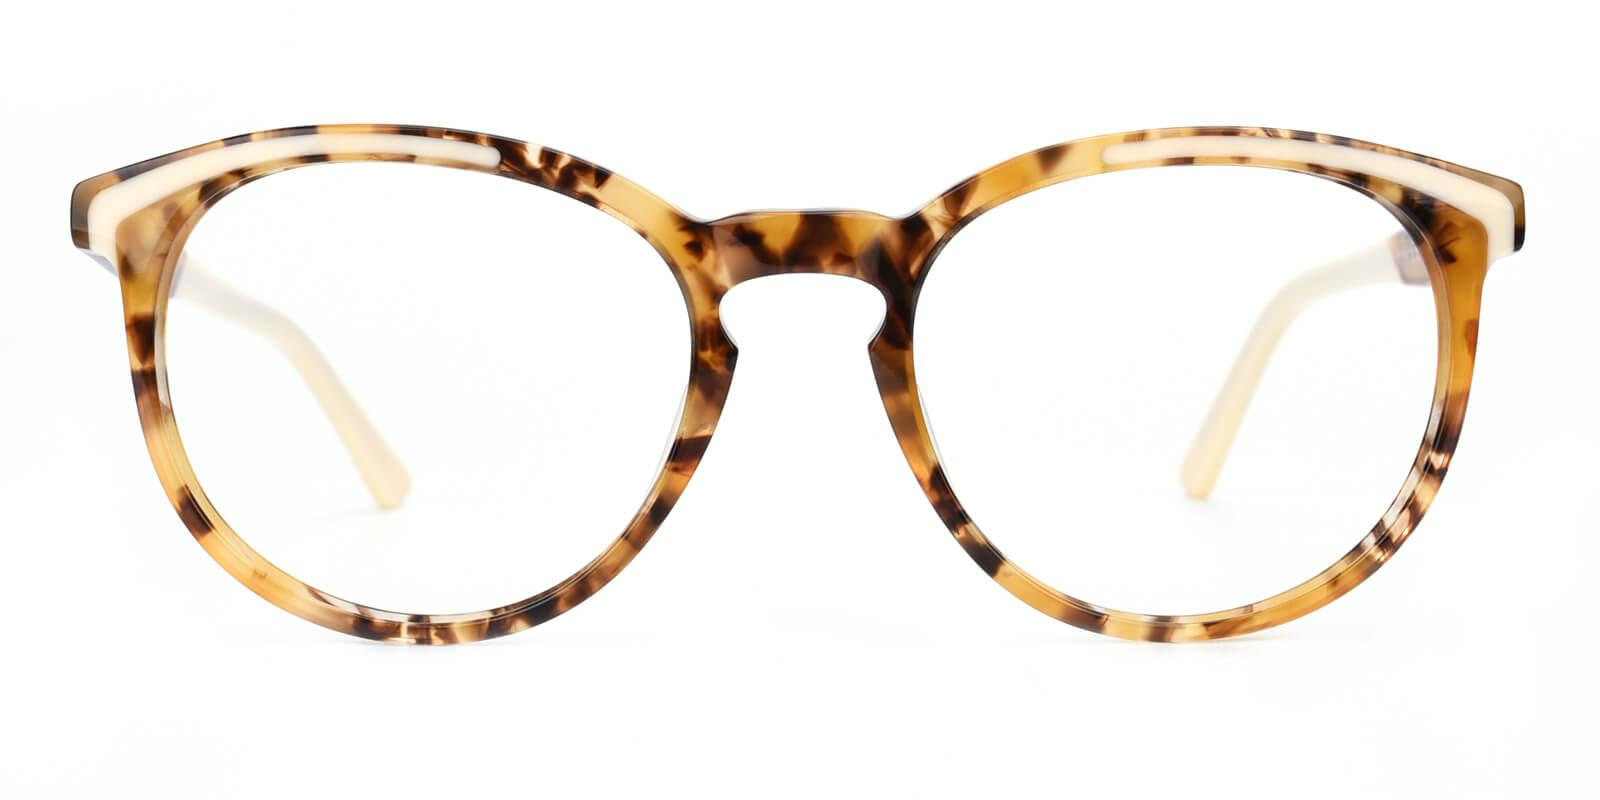 Deborah-Yellow-Oval-Acetate-Eyeglasses-additional2